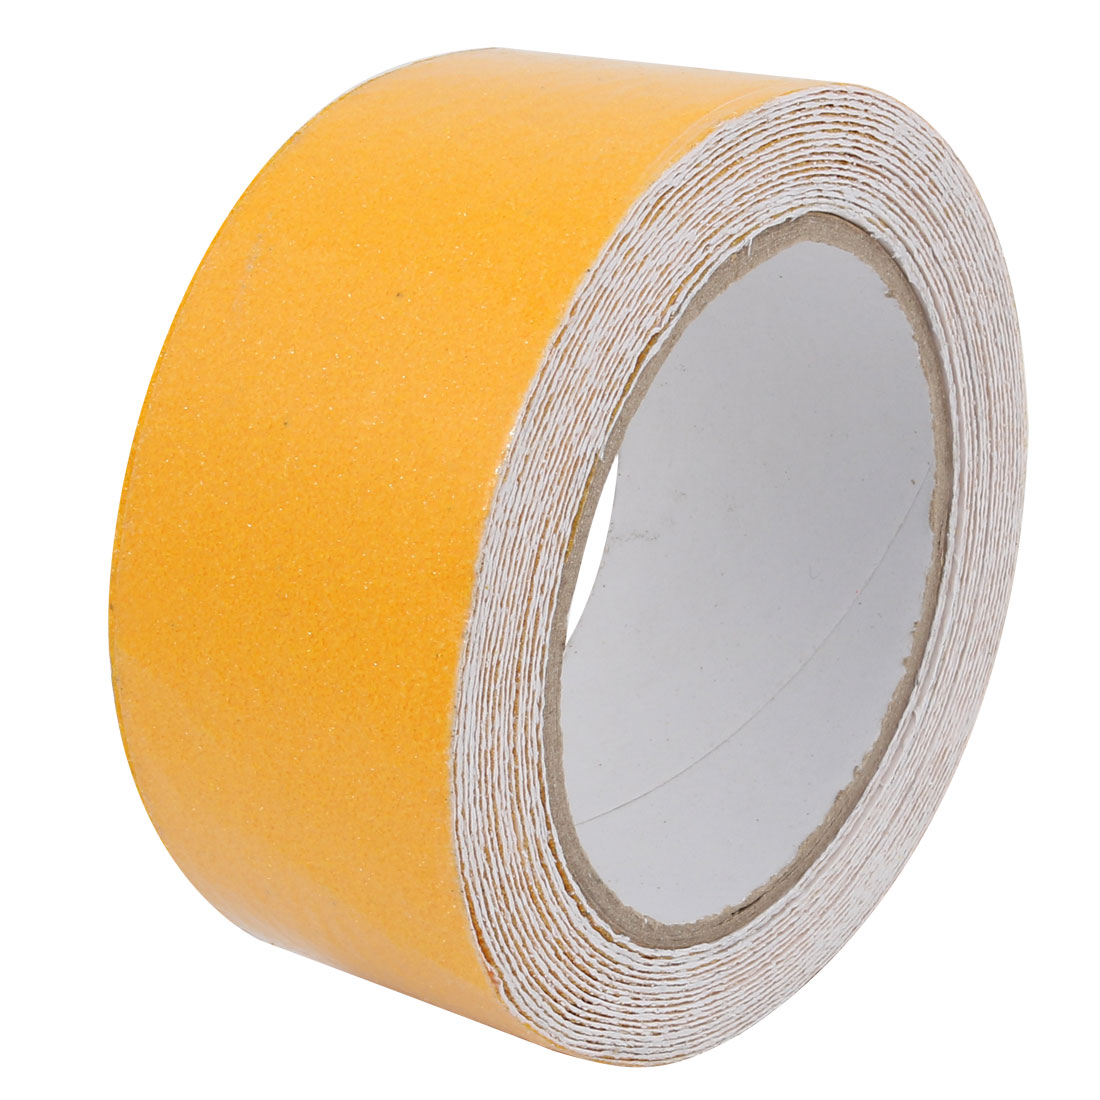 5cm Wide 5 Meters Long Adhesive Grit Anti Slip Tape Yellow for Stairs Floor